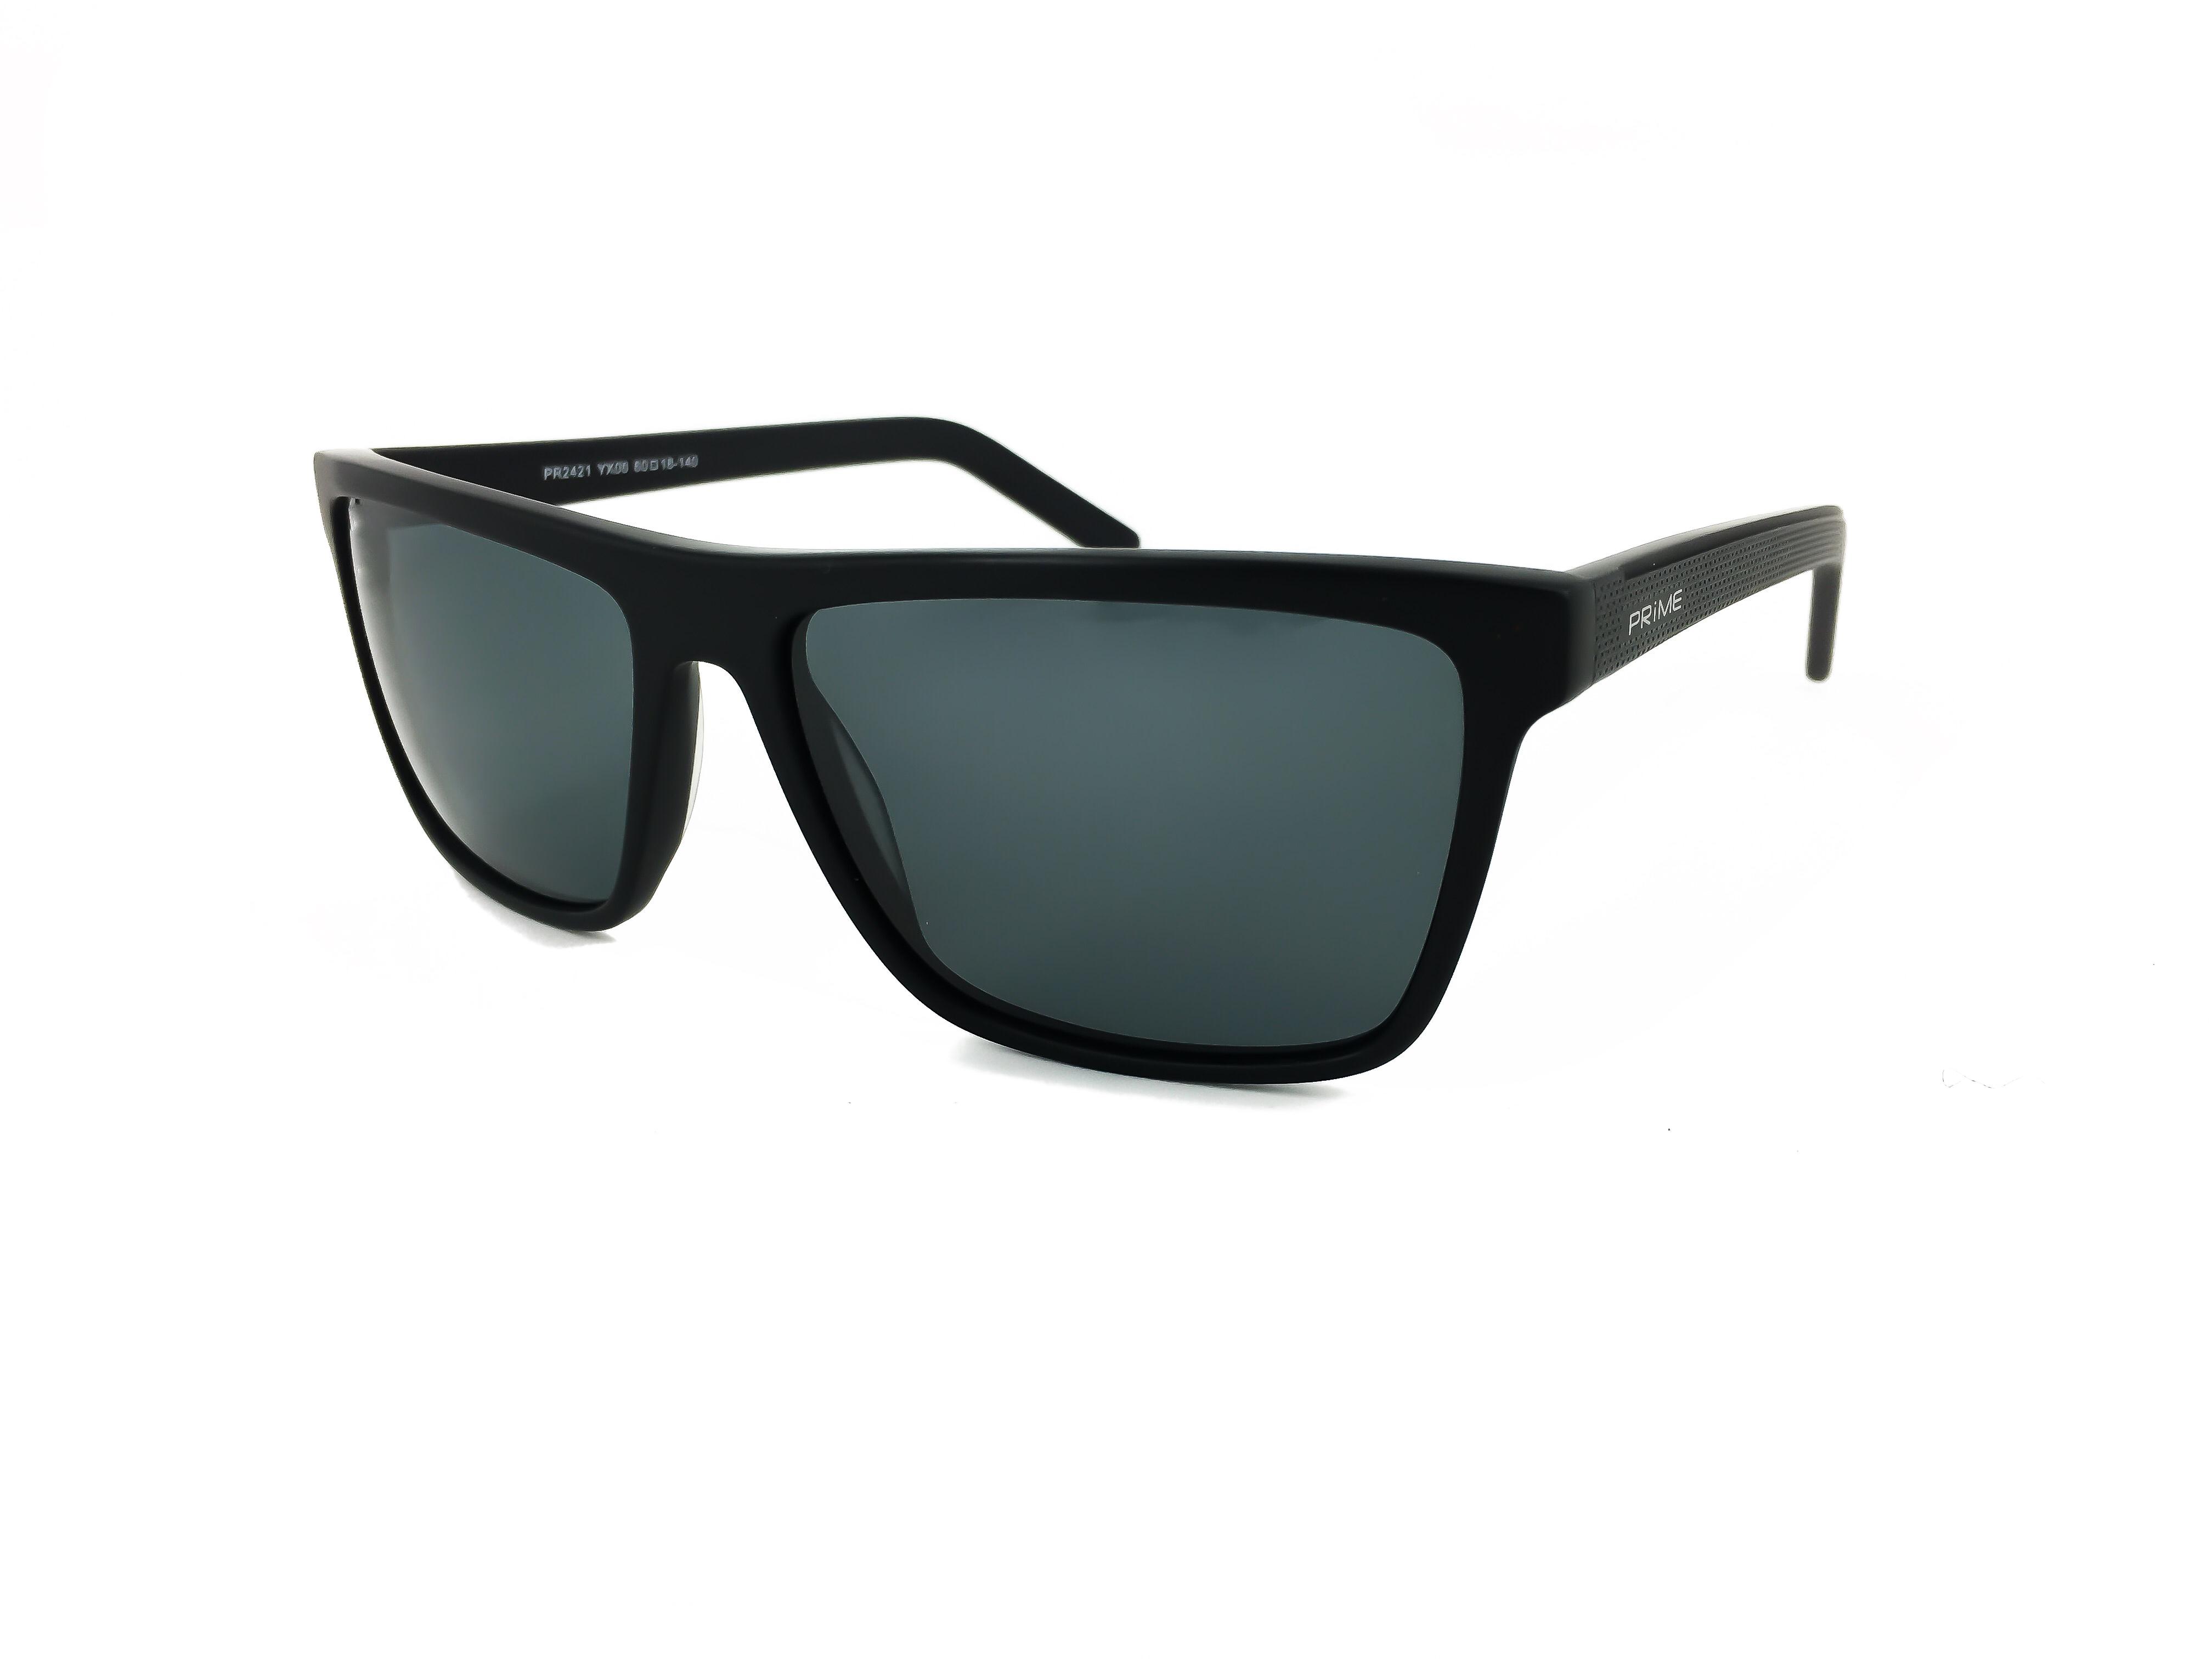 7535c5c731 Τα γυαλιά ηλίου PRIME PR 2421 YX06 είναι διαχρονικά κατασκευασμένα από  υλικά υψηλής ποιότητας και απευθύνονται σε κάθε ηλικία. Οι φακοί είναι  οργανικοί ...